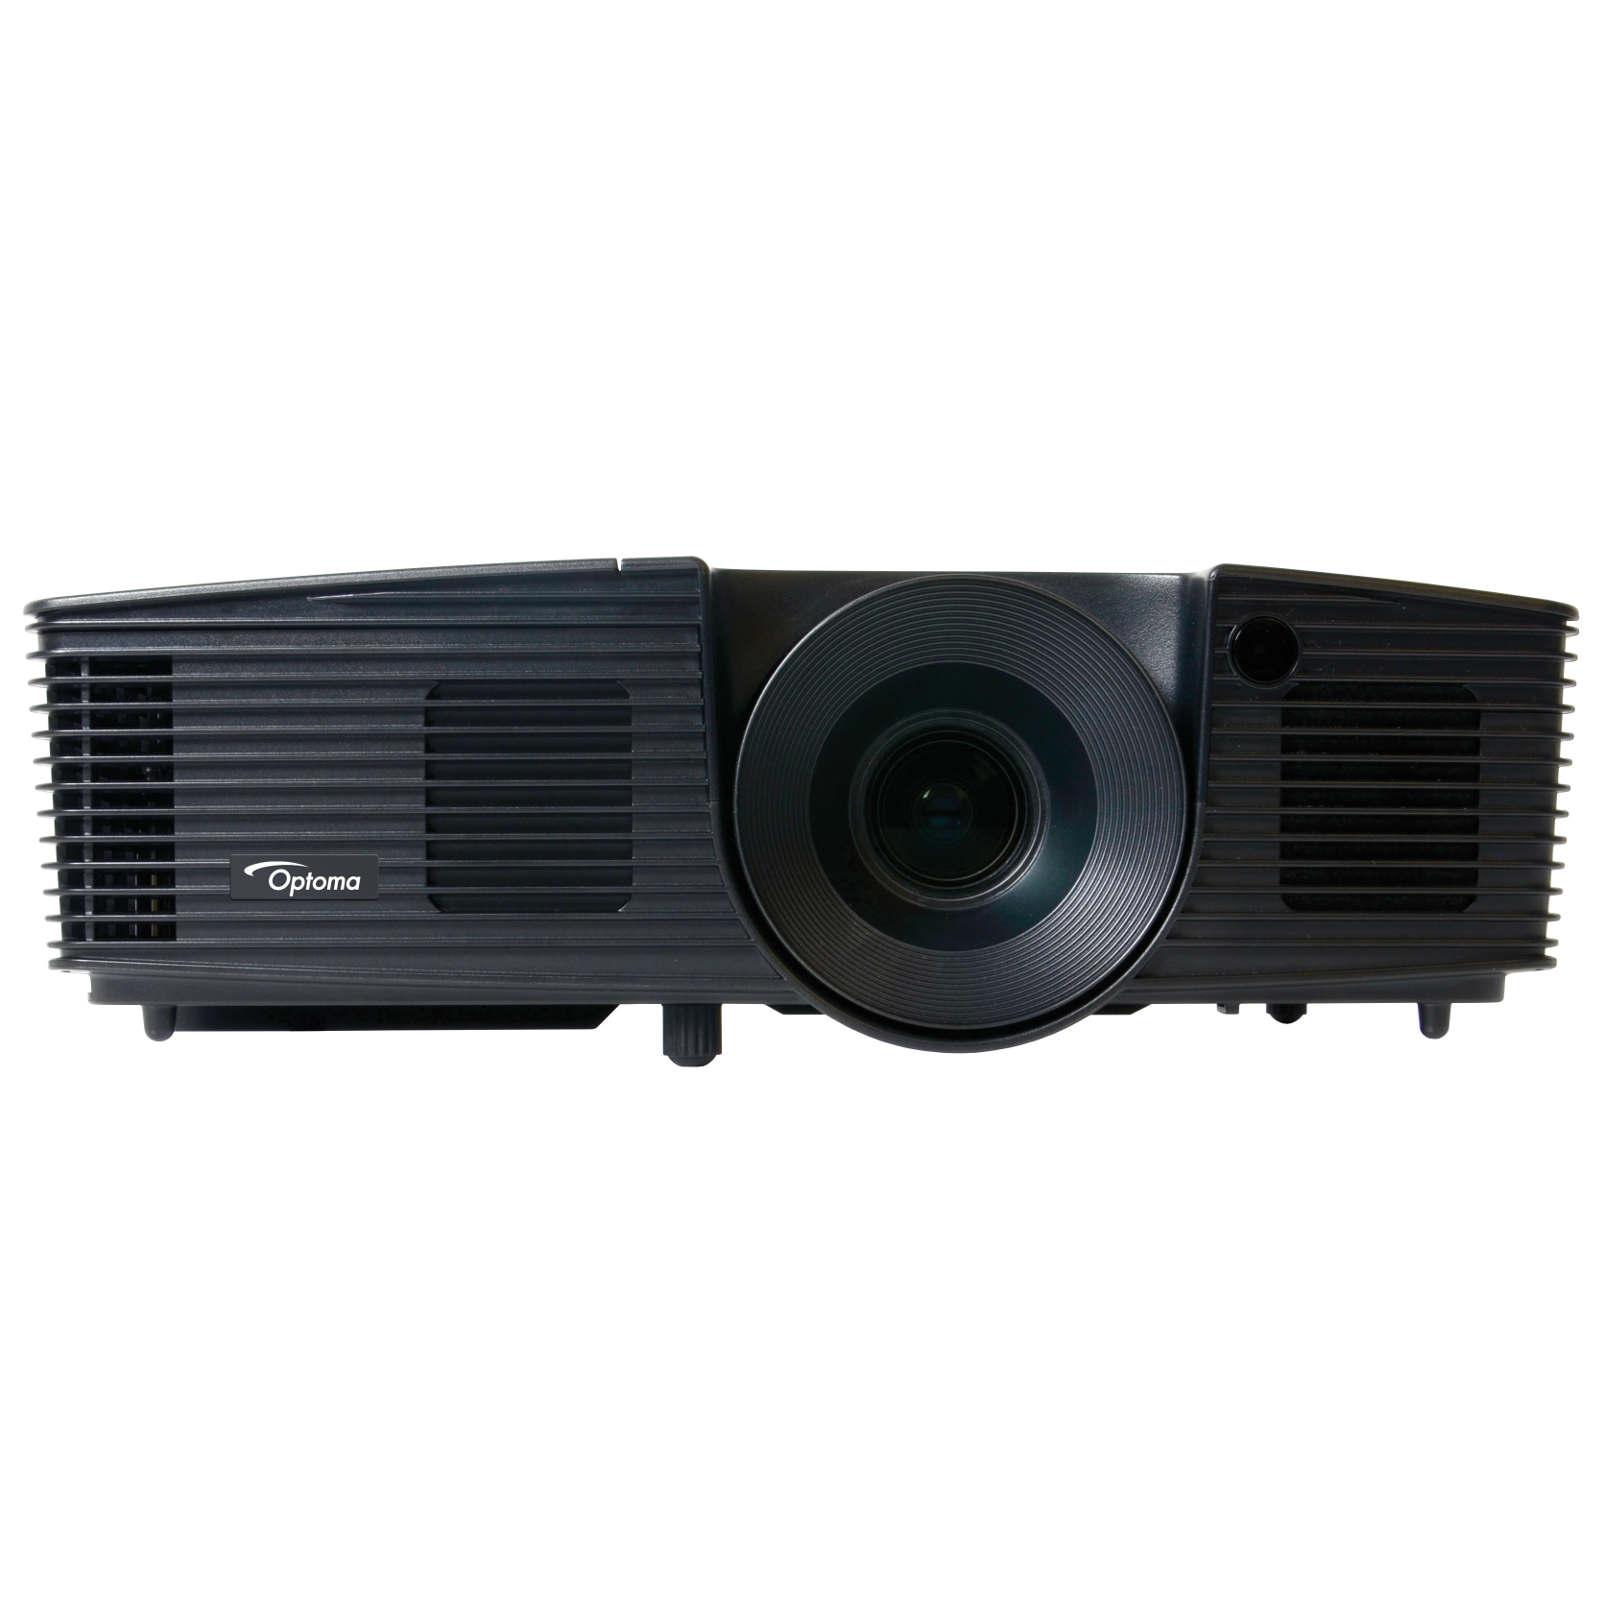 Vidéoprojecteur Optoma S316 Vidéoprojecteur DLP SVGA Full 3D 3200 Lumens avec entrée HDMI